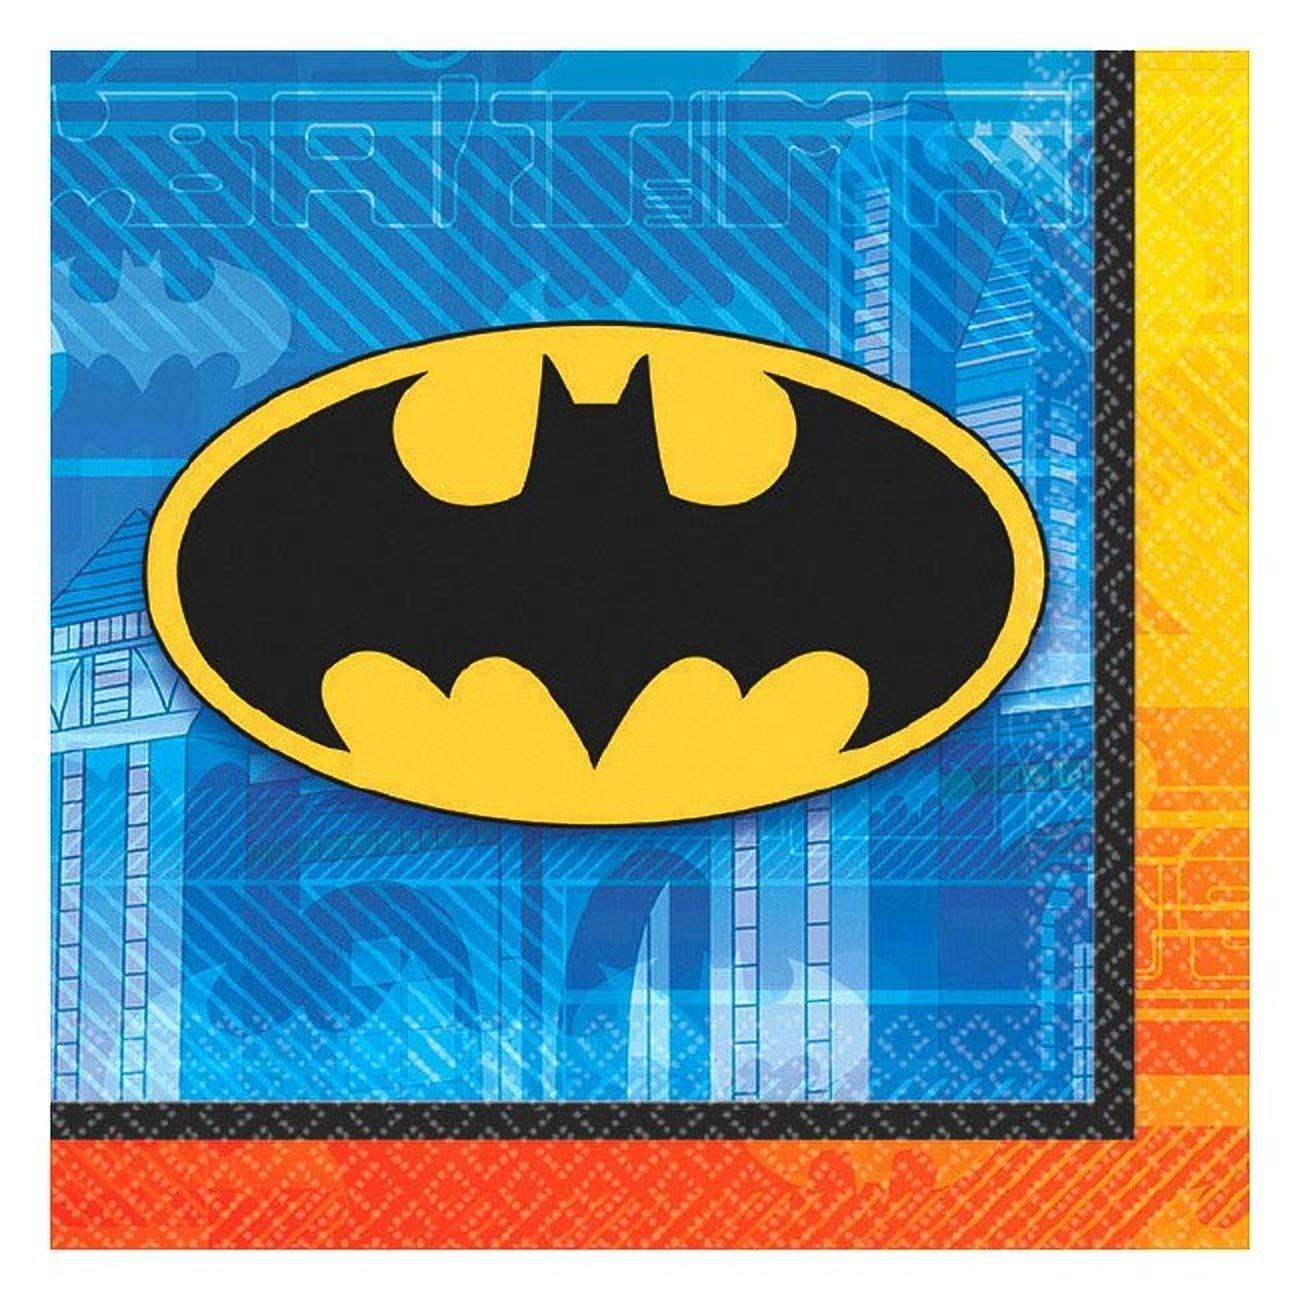 Batman Beverage Napkins (16) バットマン飲料ナプキン(16)ハロウィンクリスマス B00KYAL40Q